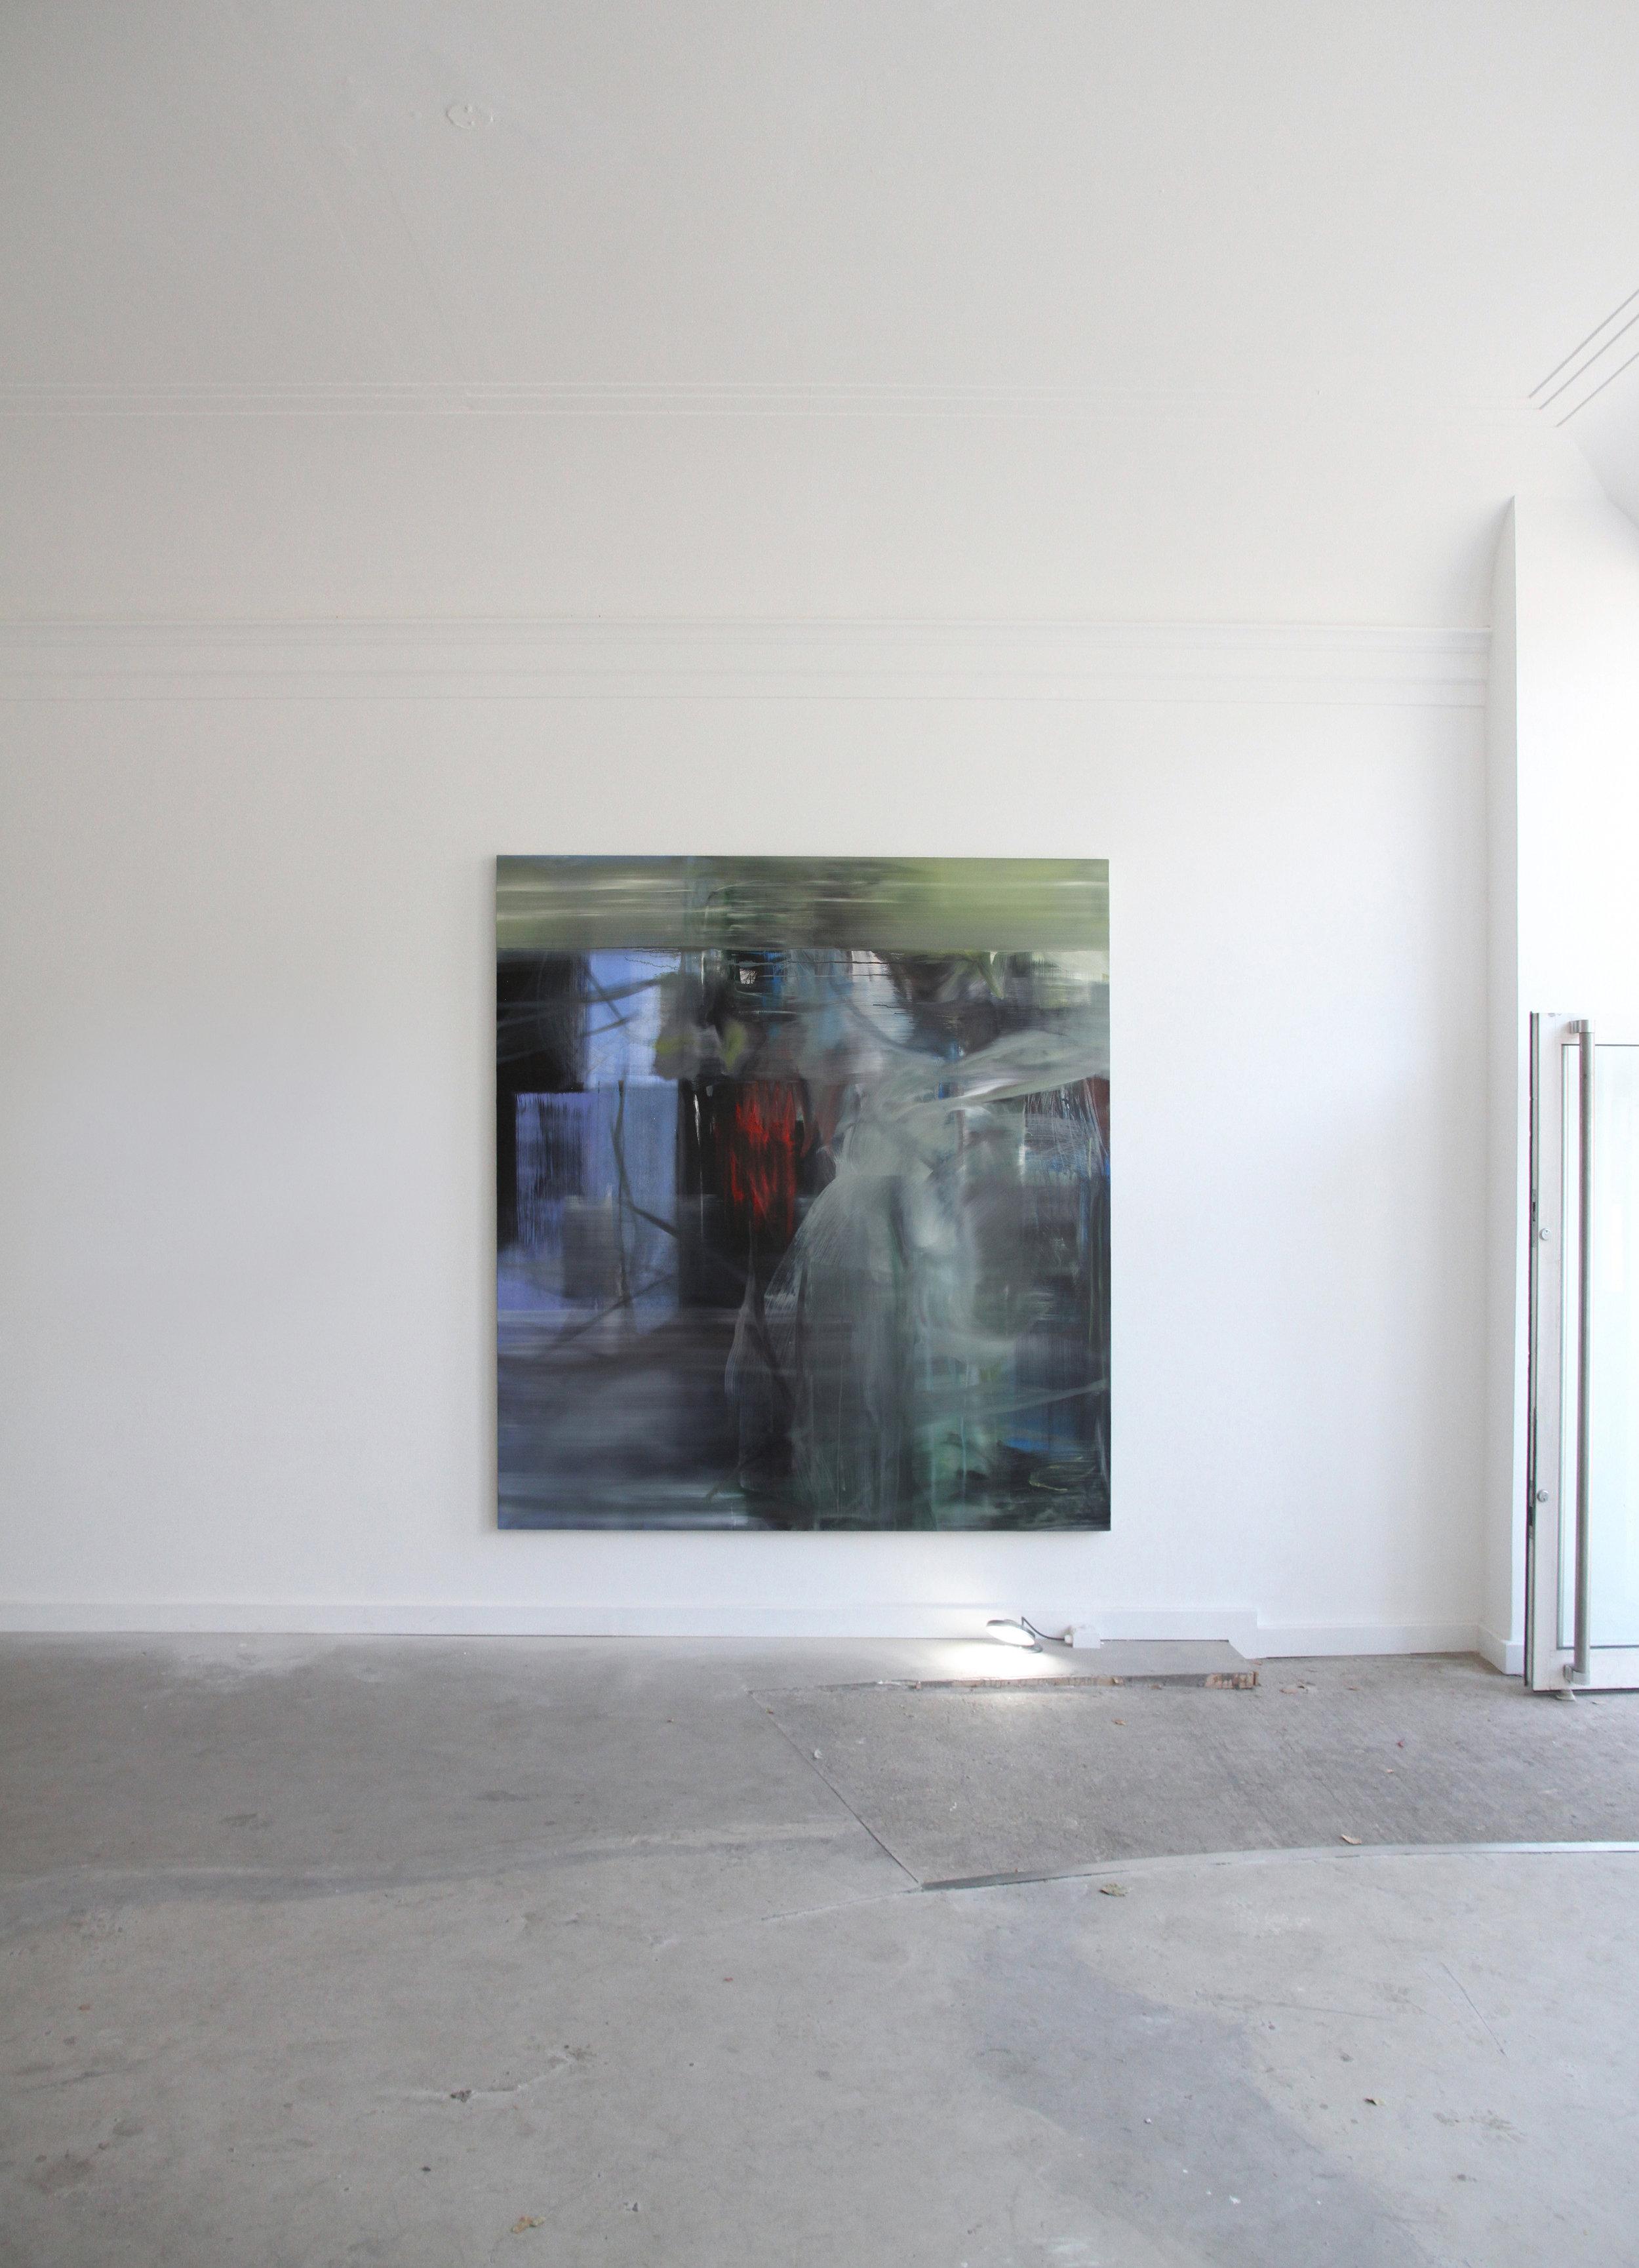 S. Derviz, Dancers III, oil on canvas, 220 x 200cm, 2018 (1.2 Vardaxoglou).jpg